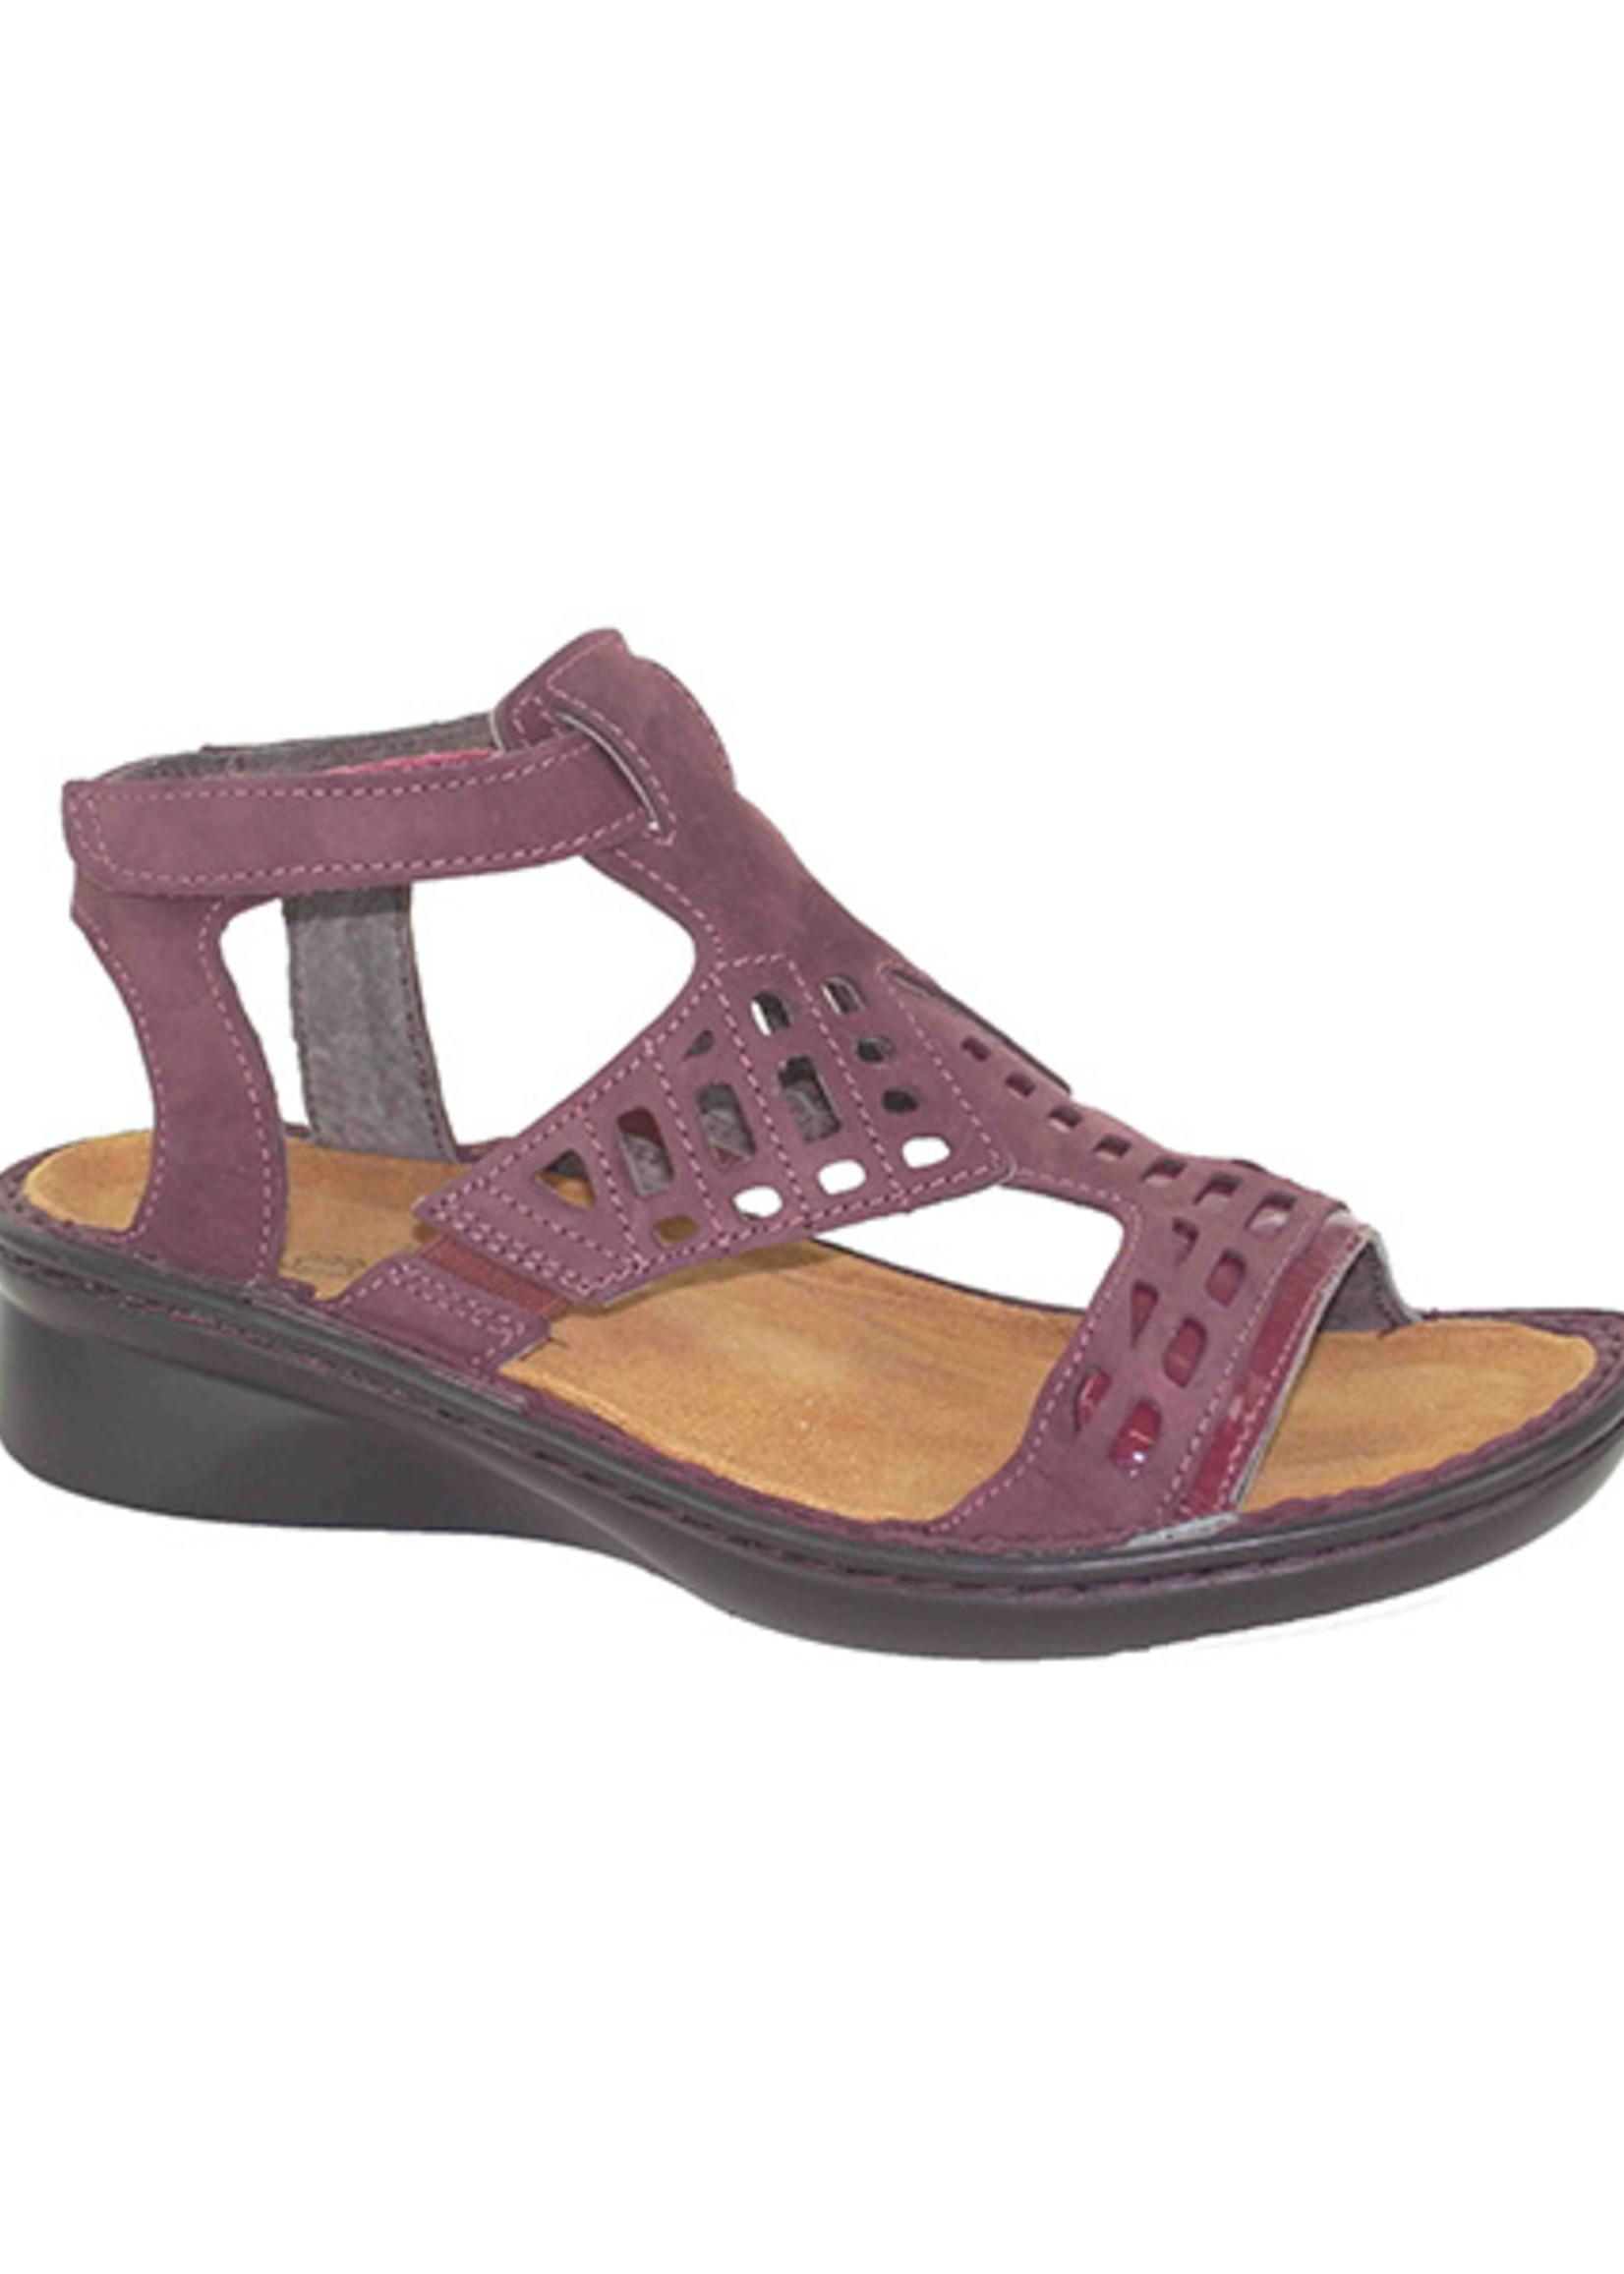 Naot Footwear String in Shiraz Combo